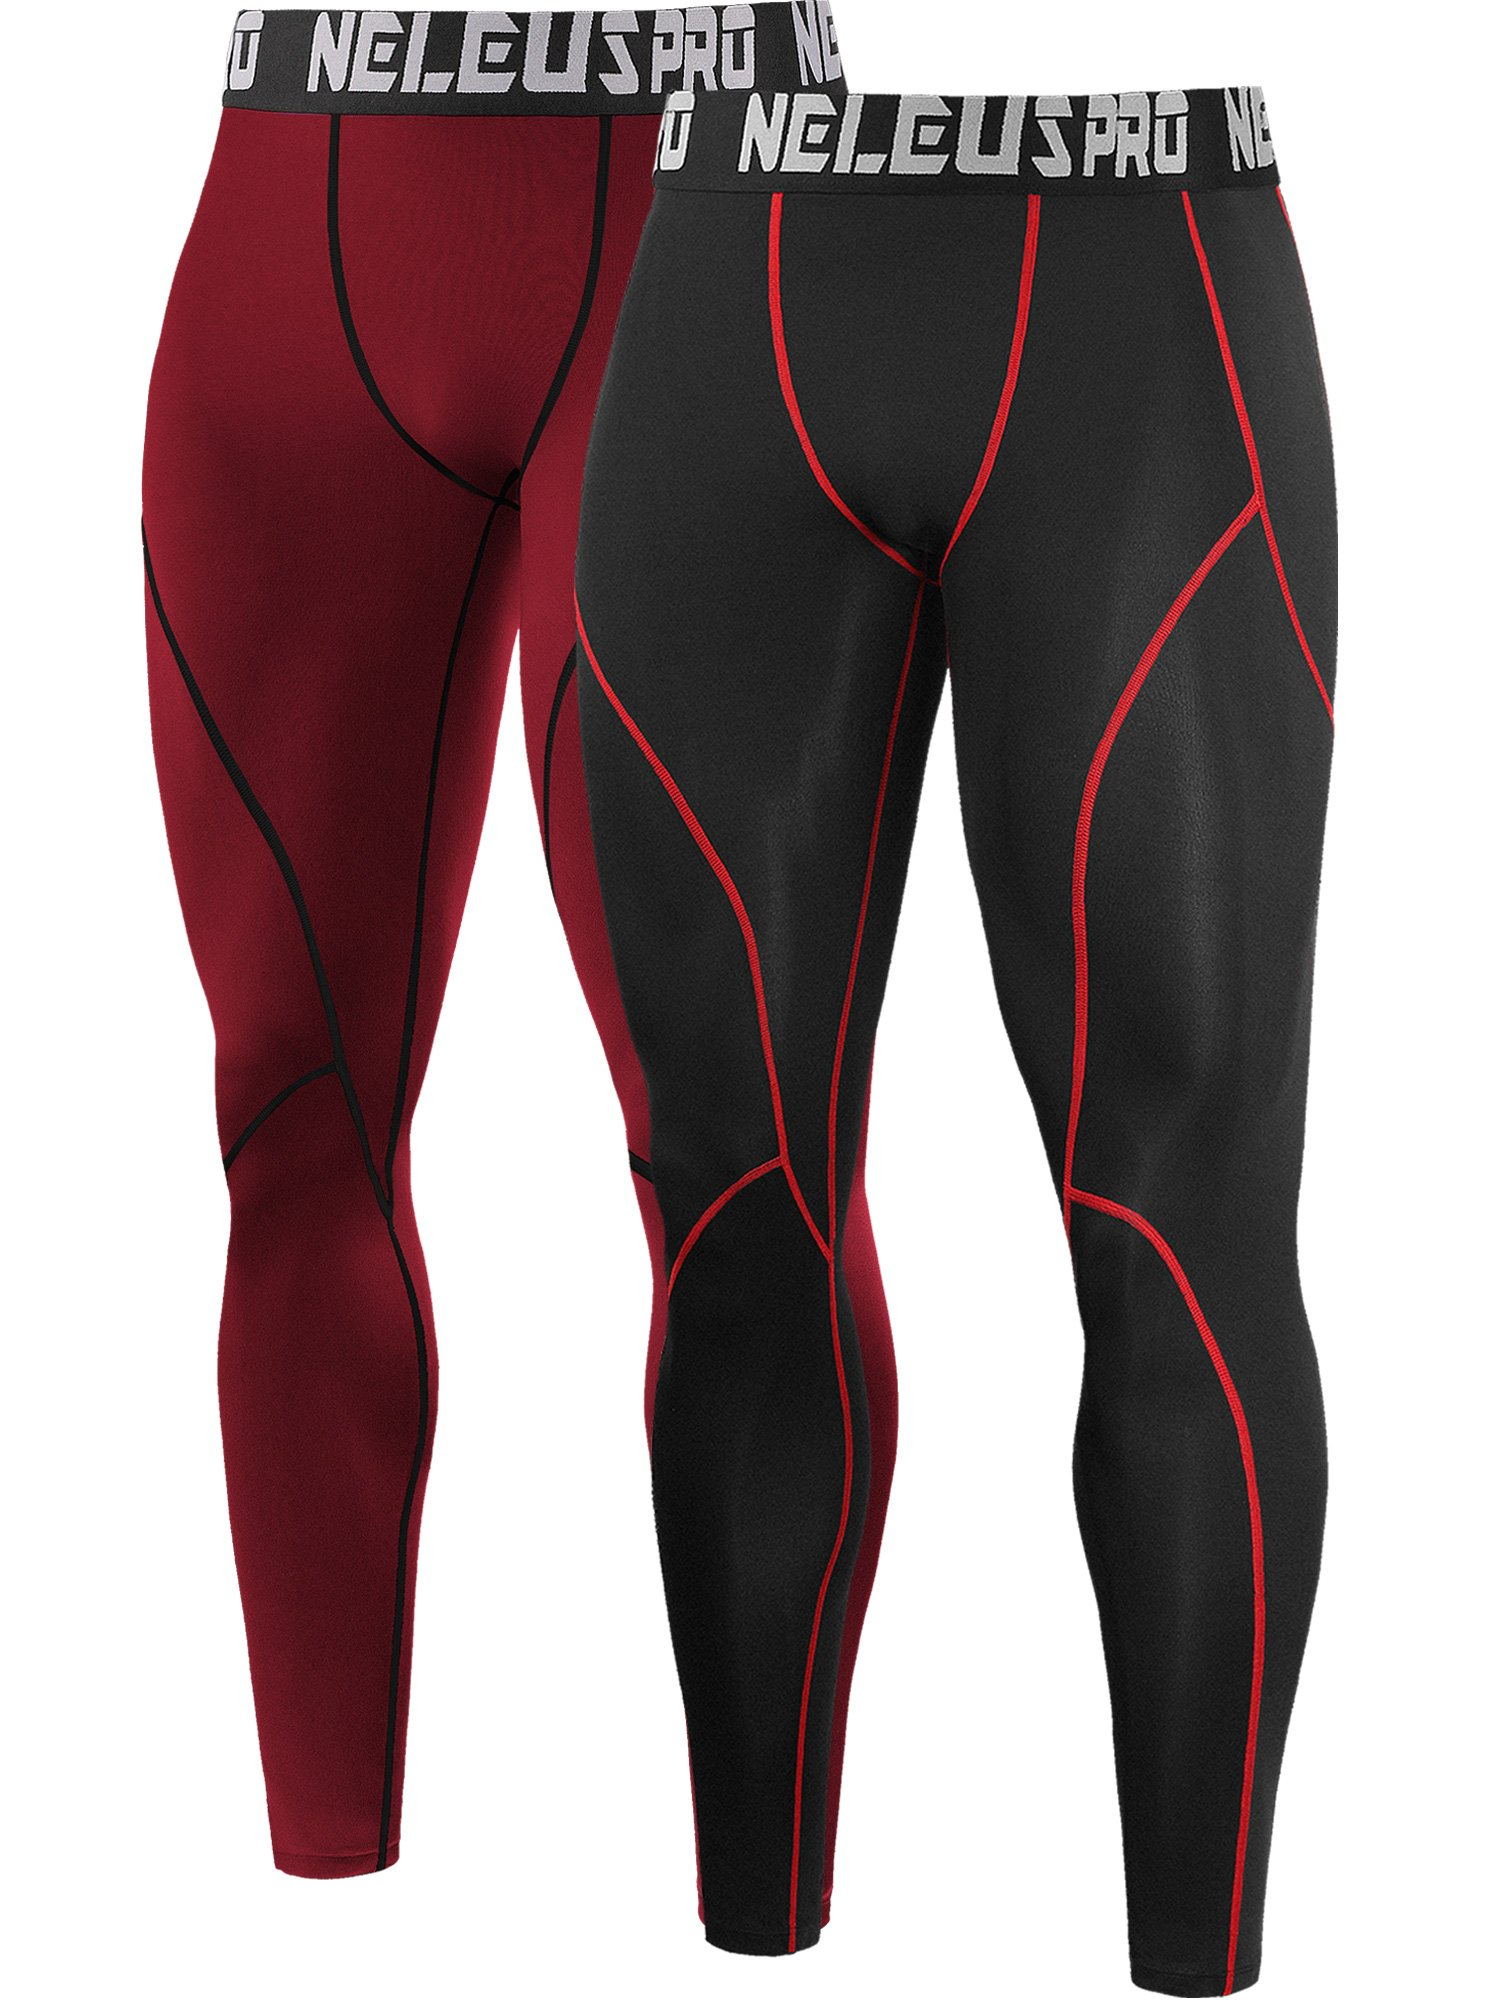 Neleus Men's 2 Pack Compression Pants Workout Running Tights Leggings,6013,Black (Red Stripe),Red,US S,EU M